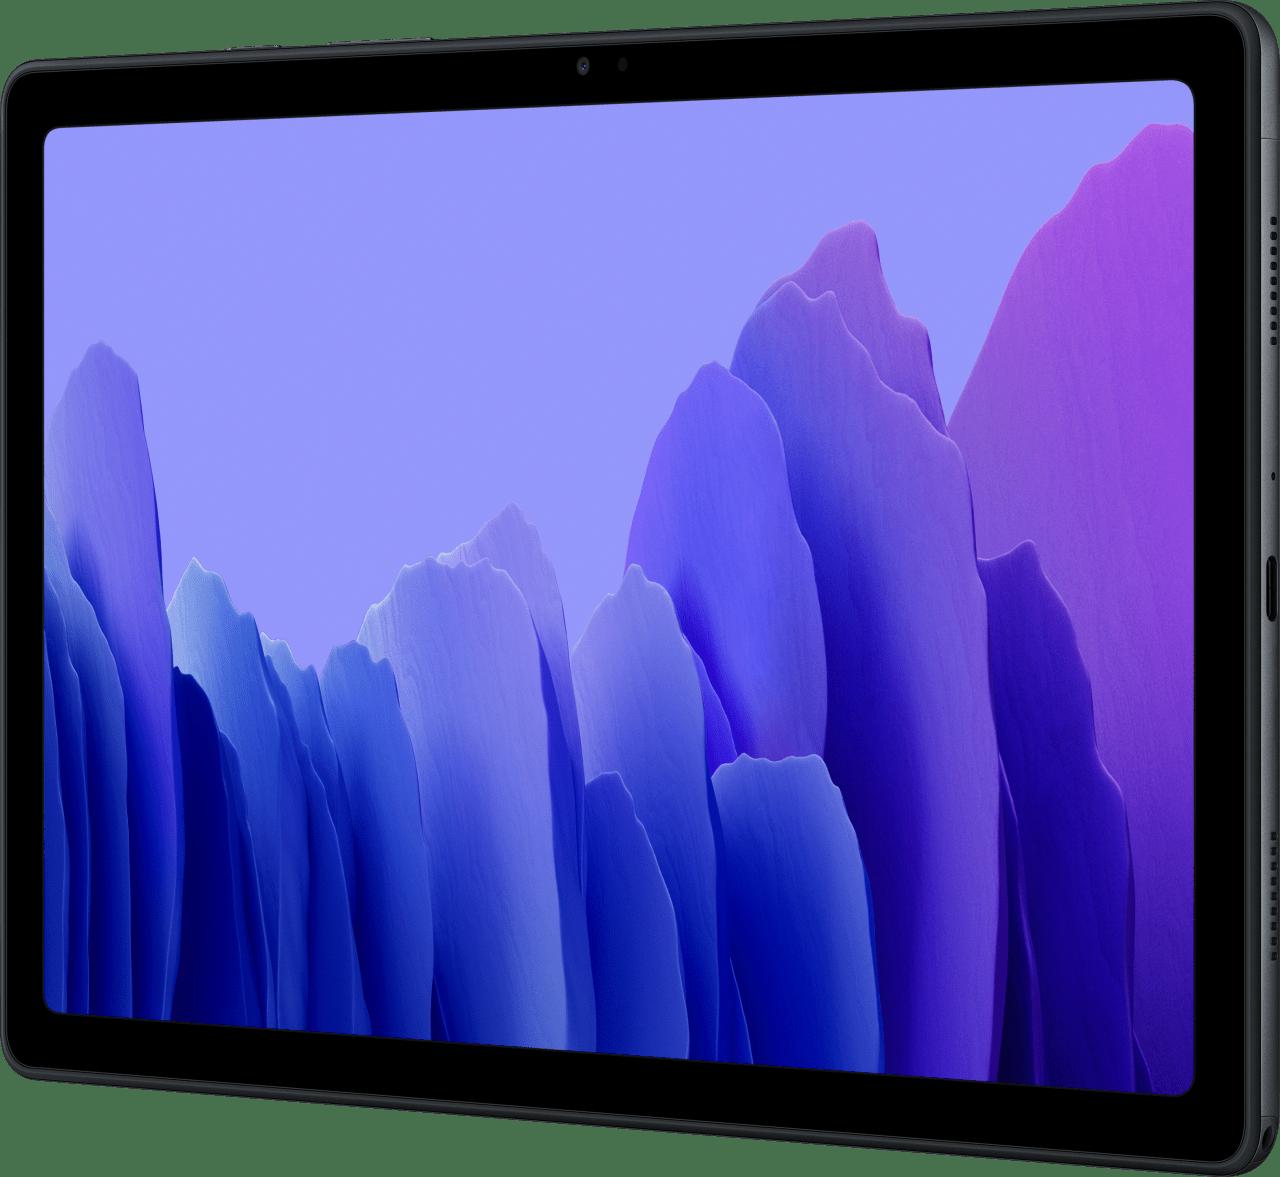 Dark Gray Samsung Tablet Galaxy Tab A7 (2020) - WiFi - Android™ 10 - 32GB.2